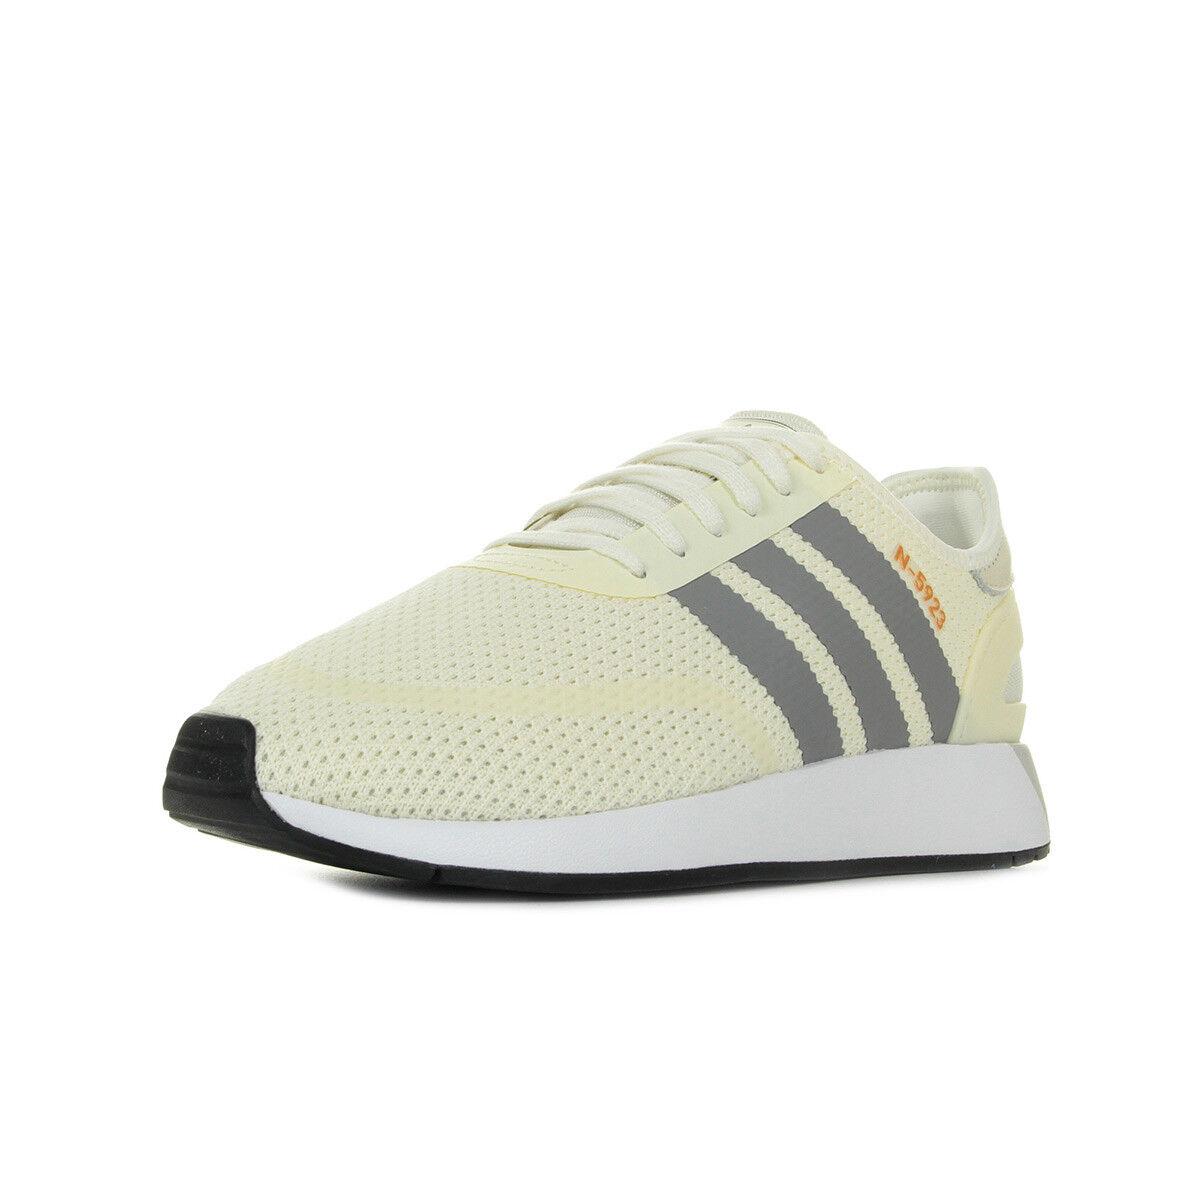 Chaussures ADIDAS Homme n-5923 Beige